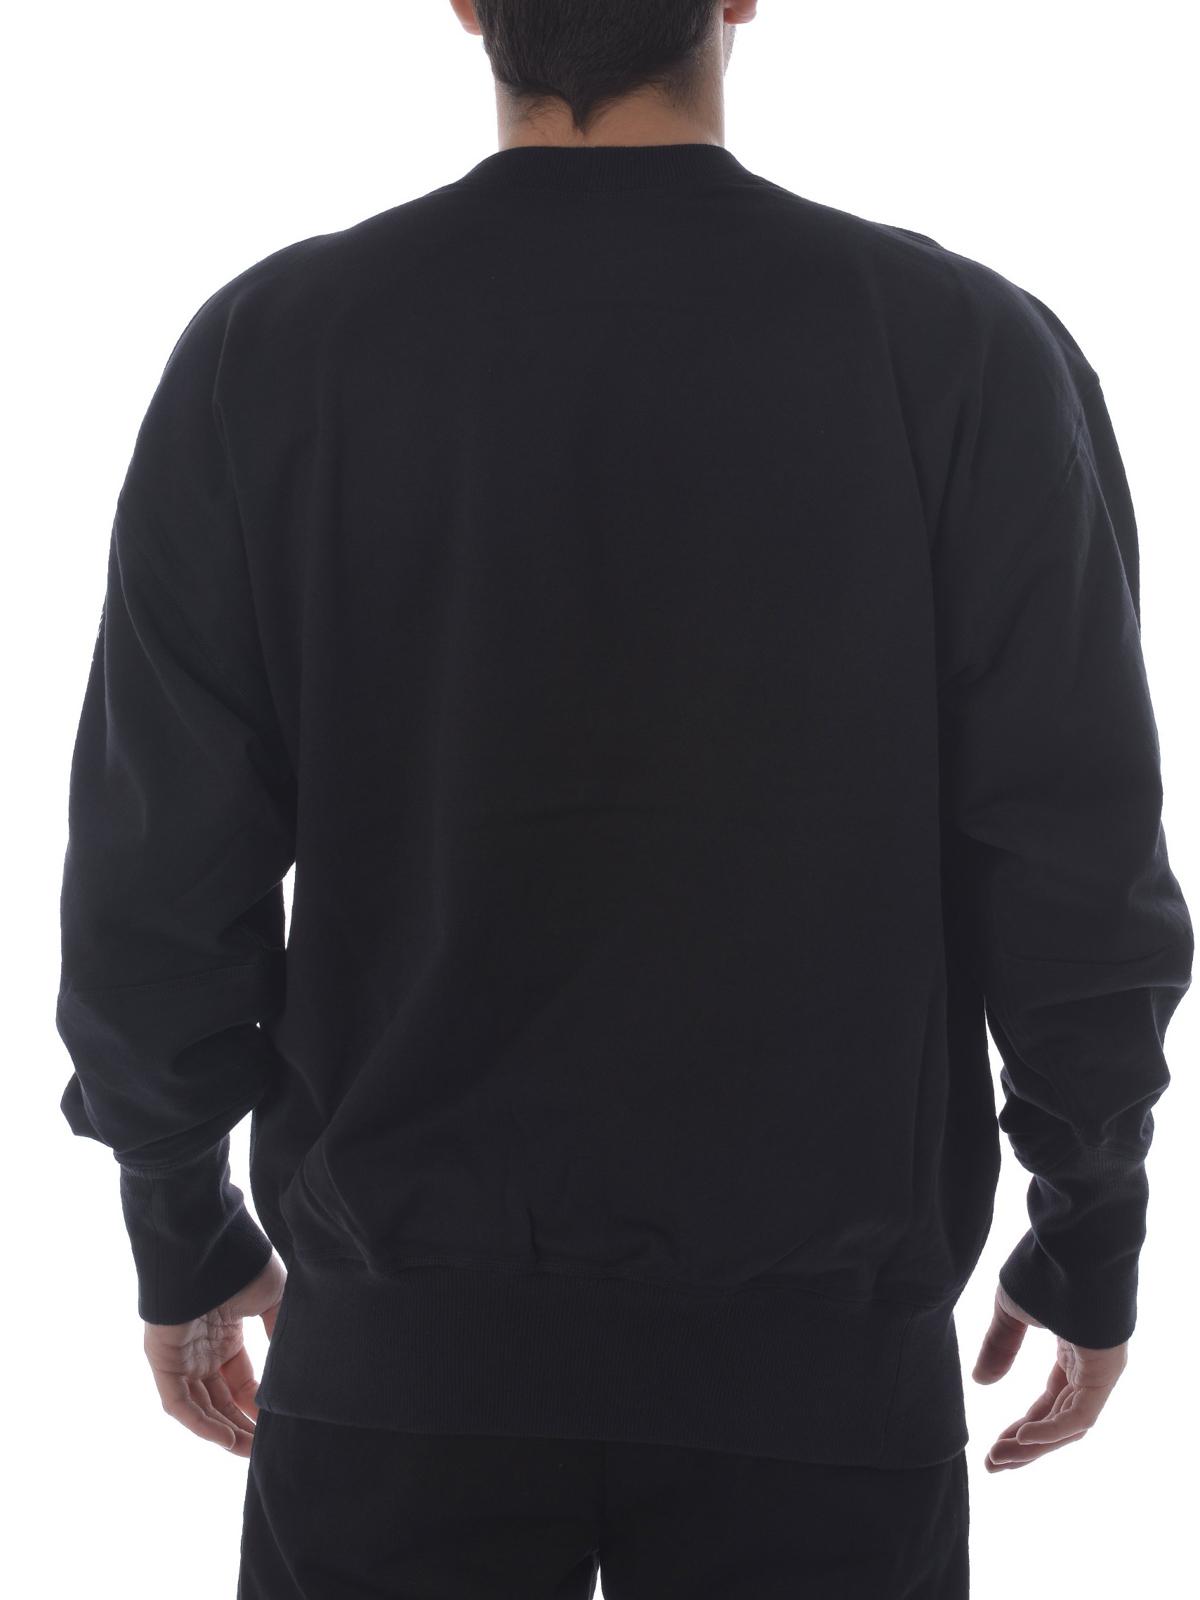 quality design 83faa d3b67 Cotton oversized logo sweatshirt shop online  ADIDAS Y-3